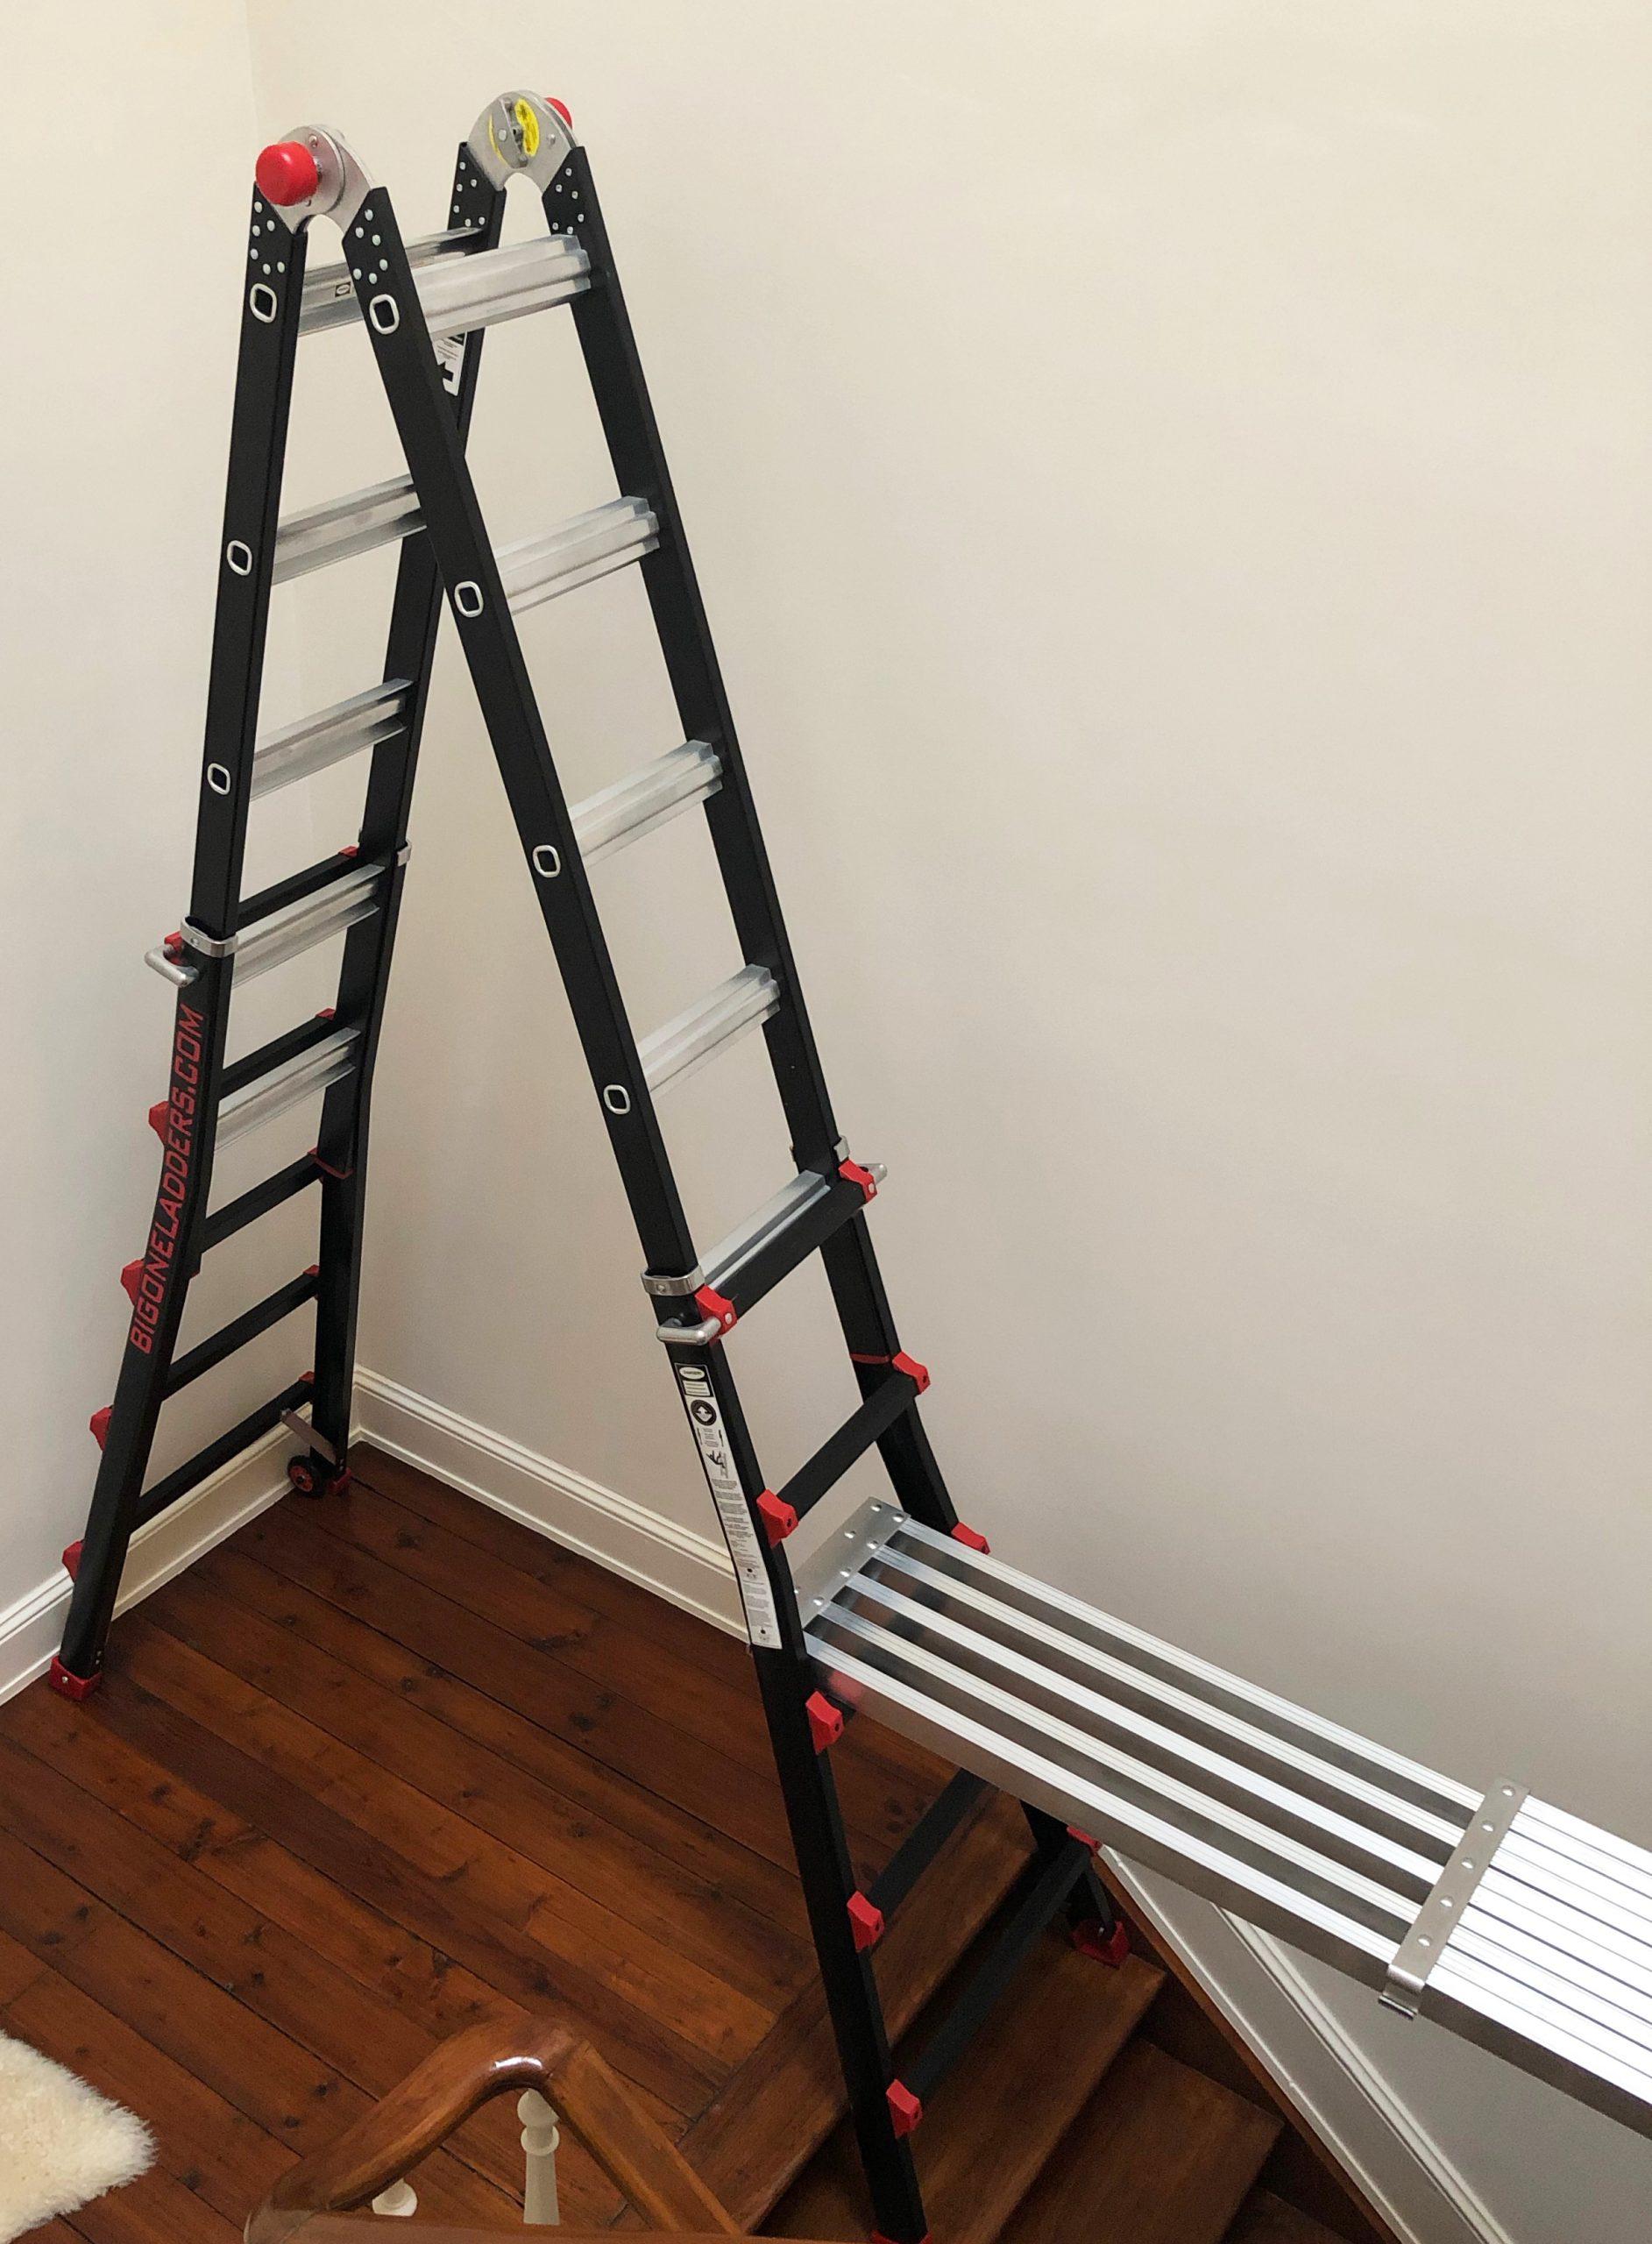 4x5 bigone ladder met telescopisch platform op trap